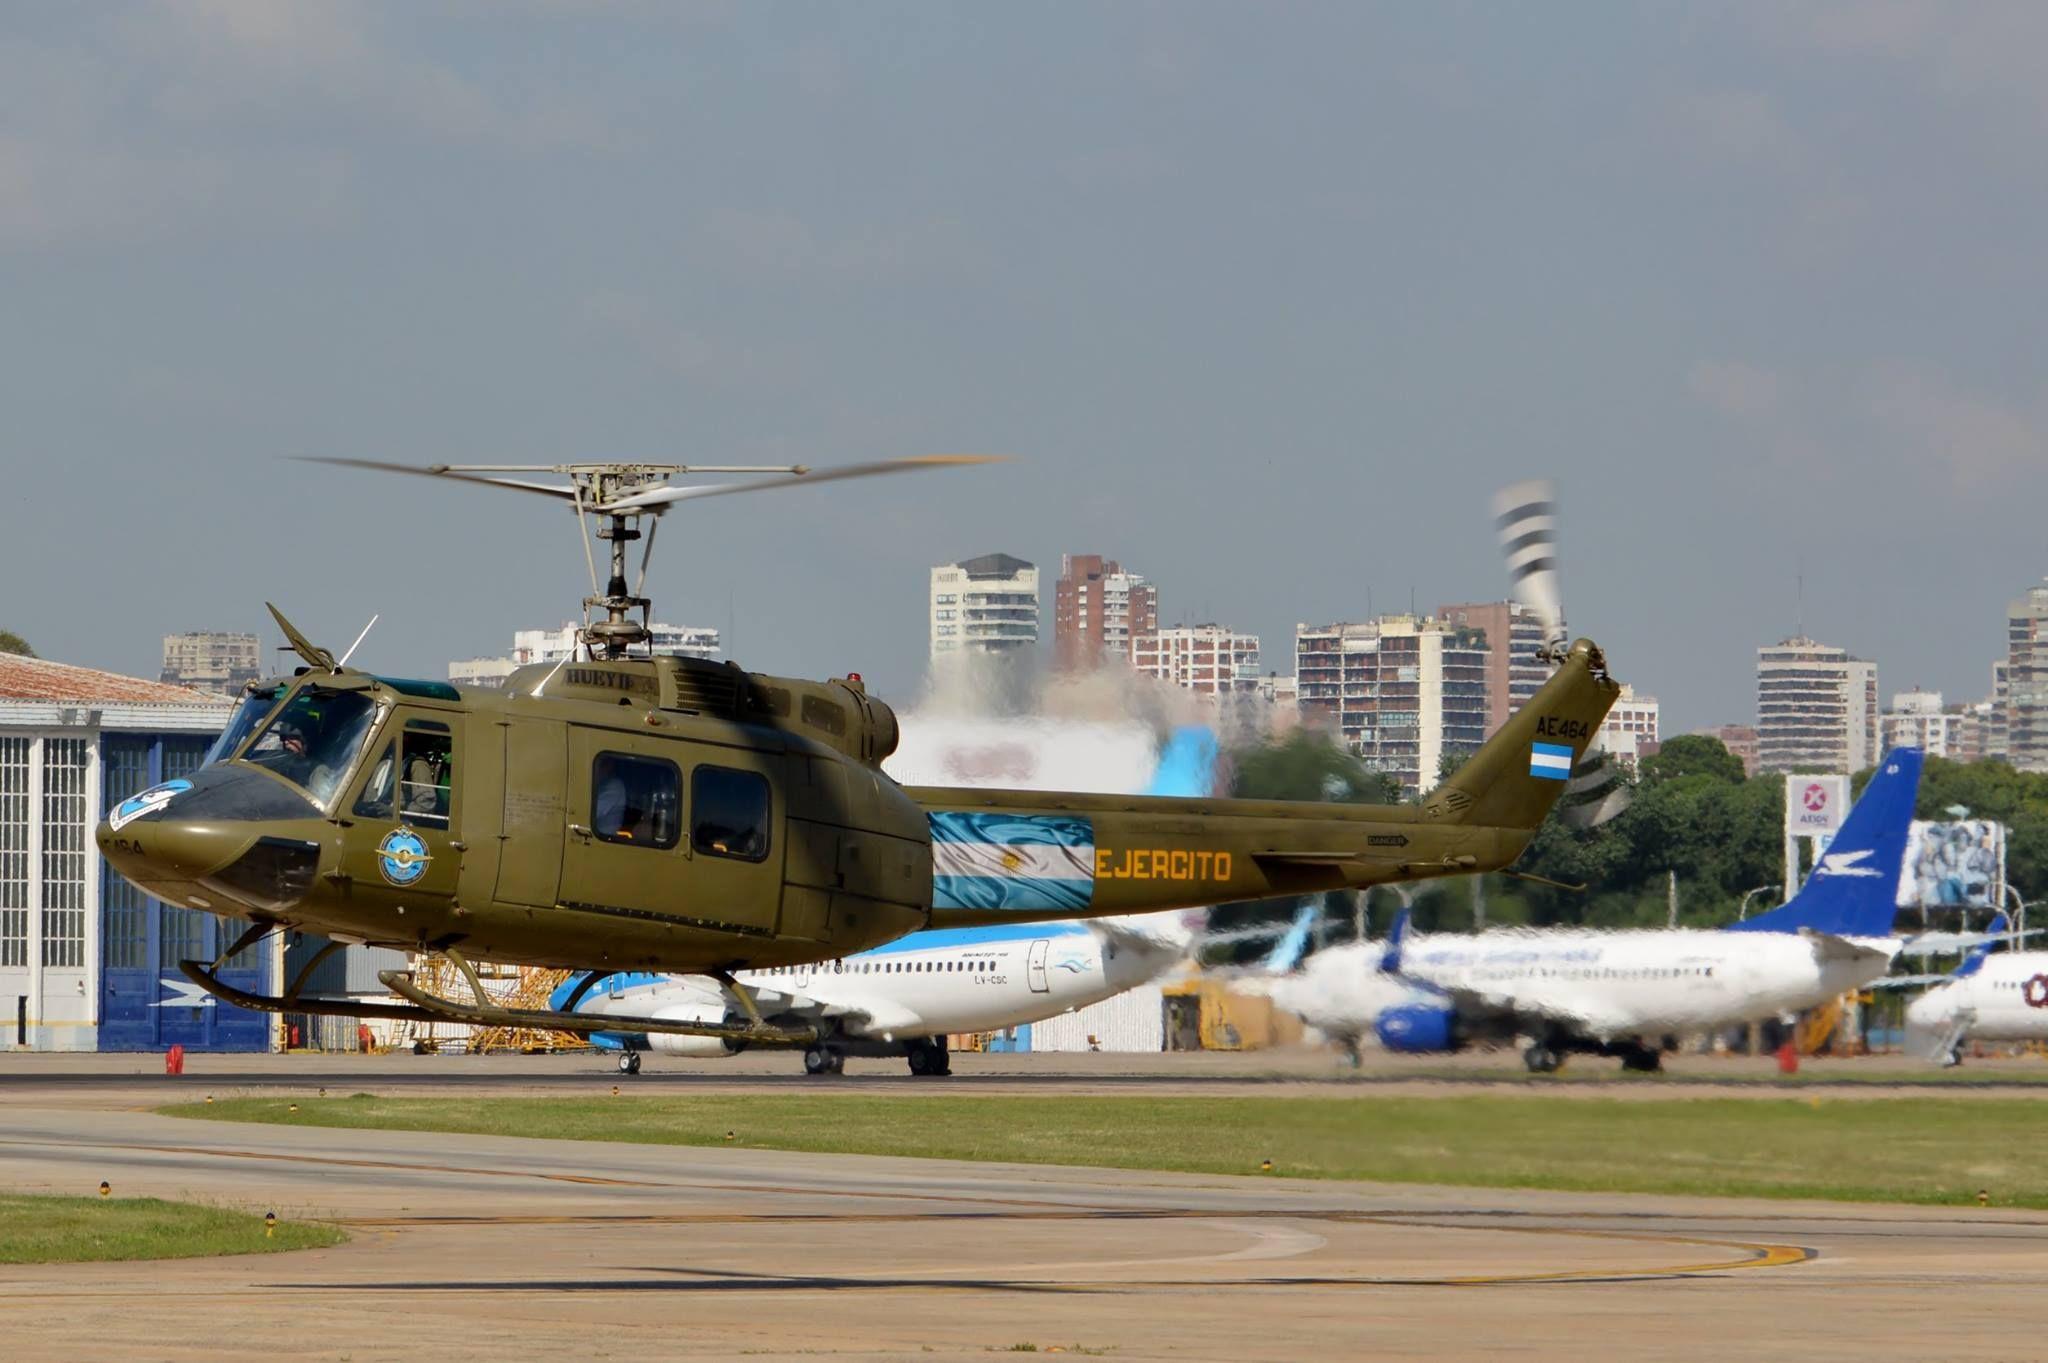 EA-464 de la AE